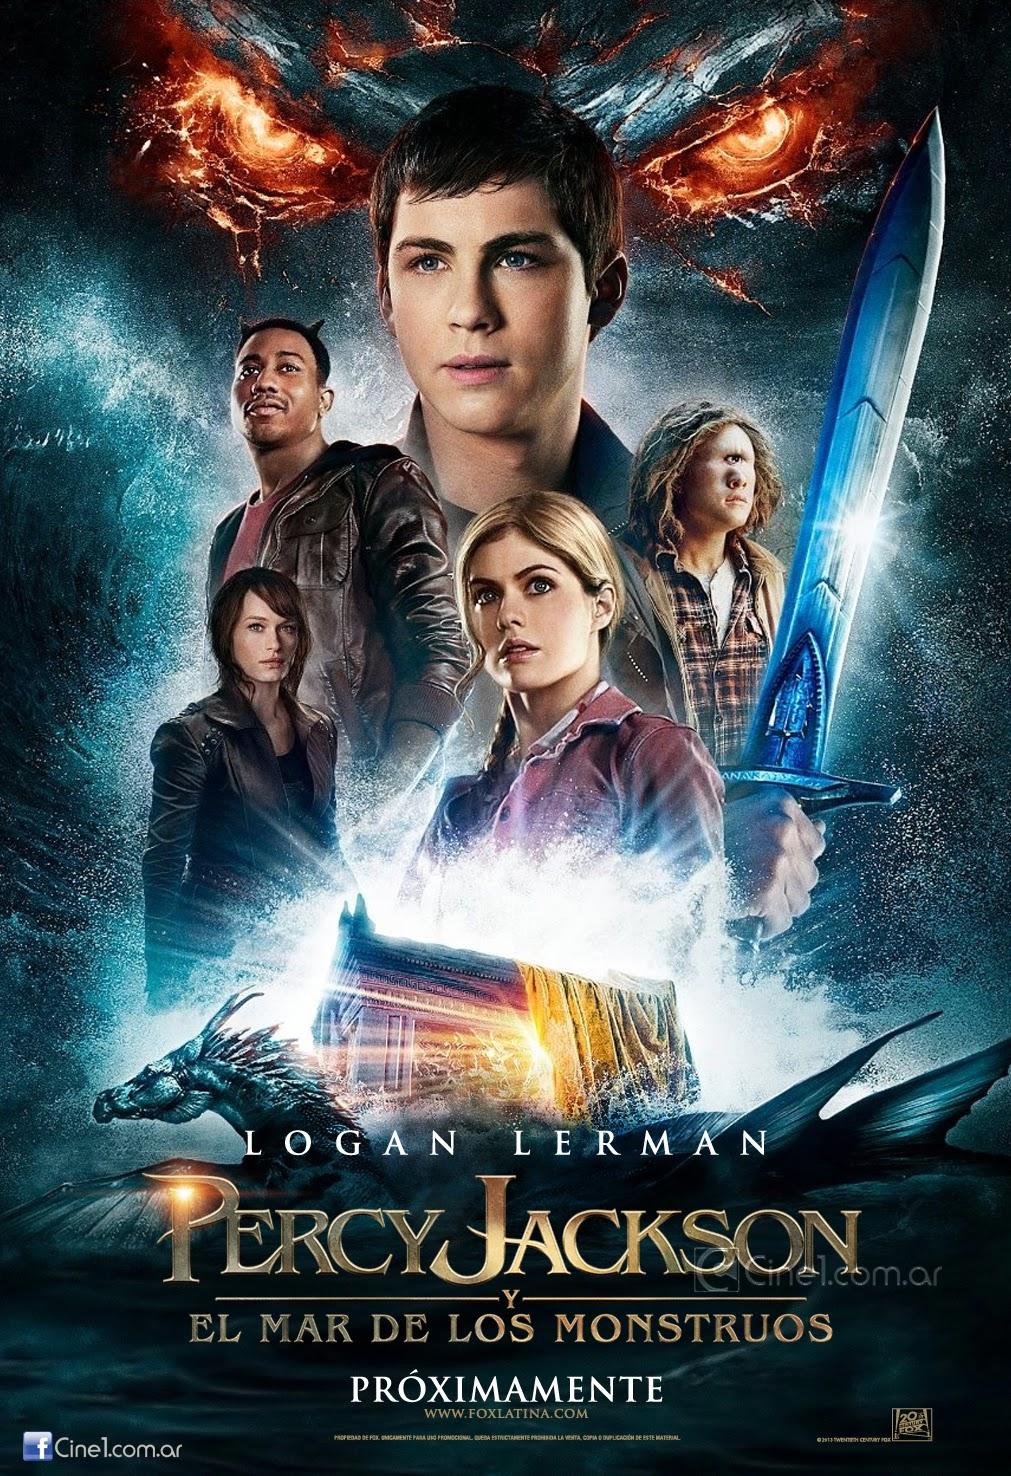 percy jackson movie 1 download